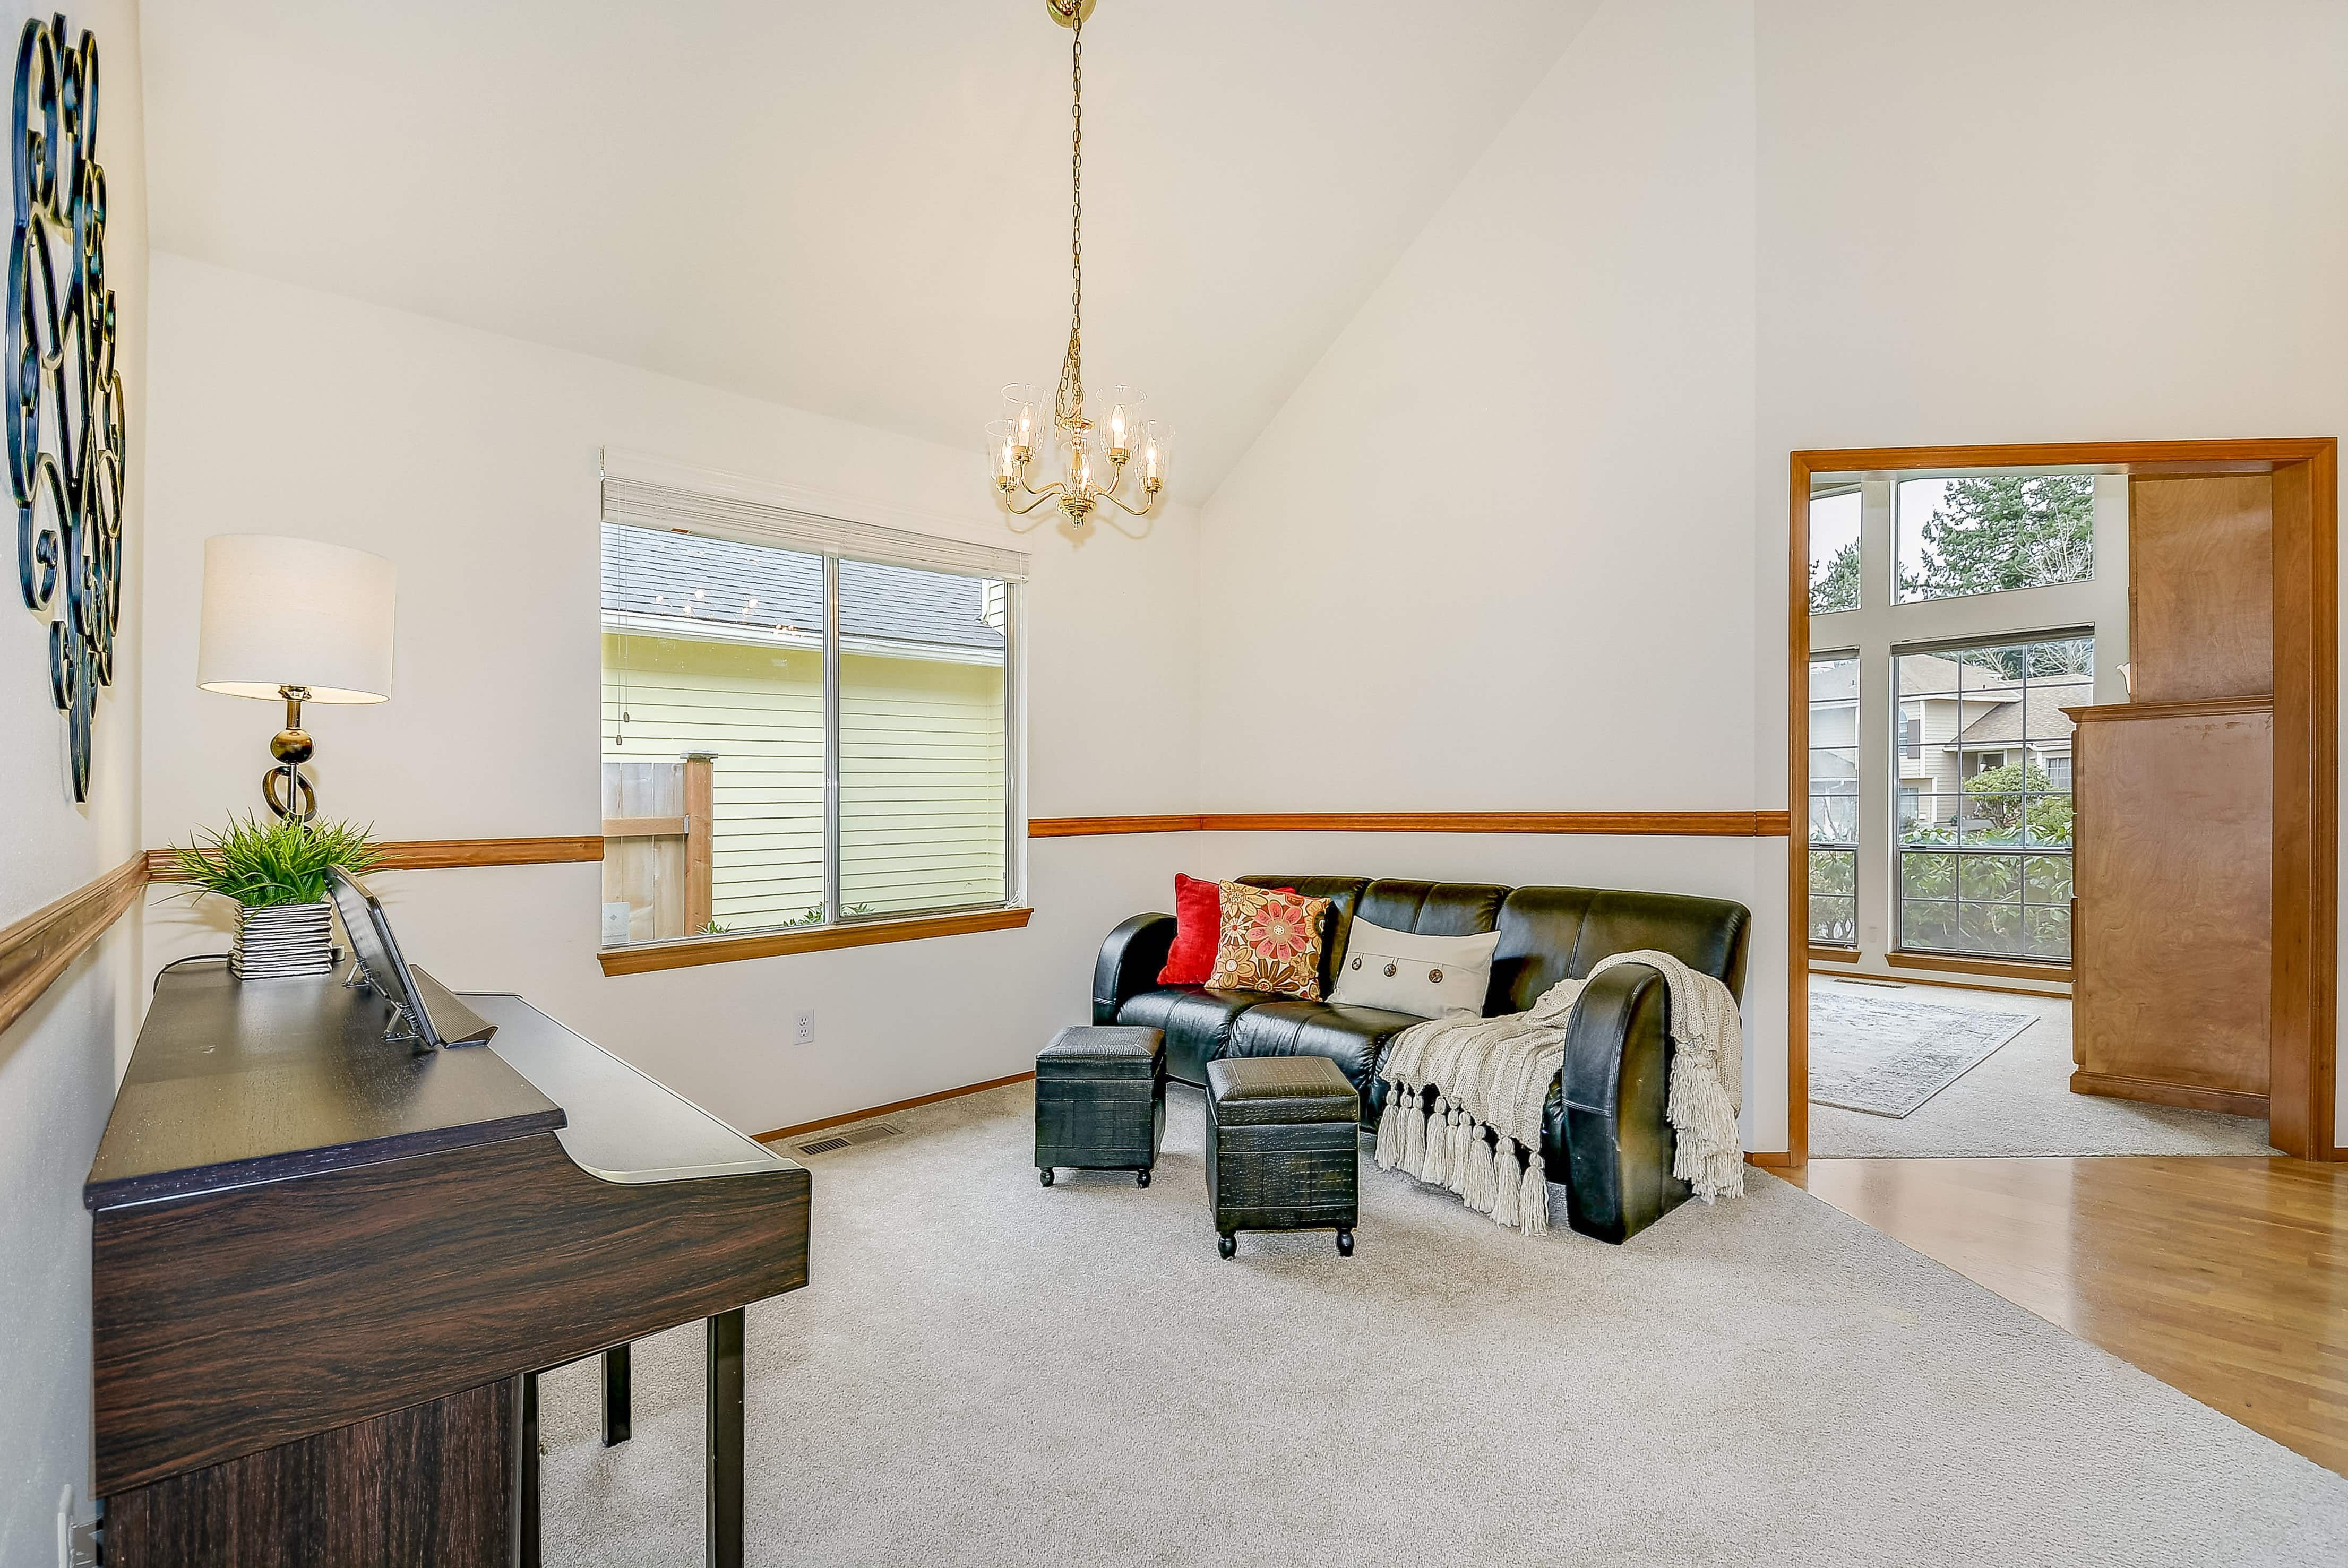 007_Formal Living Room